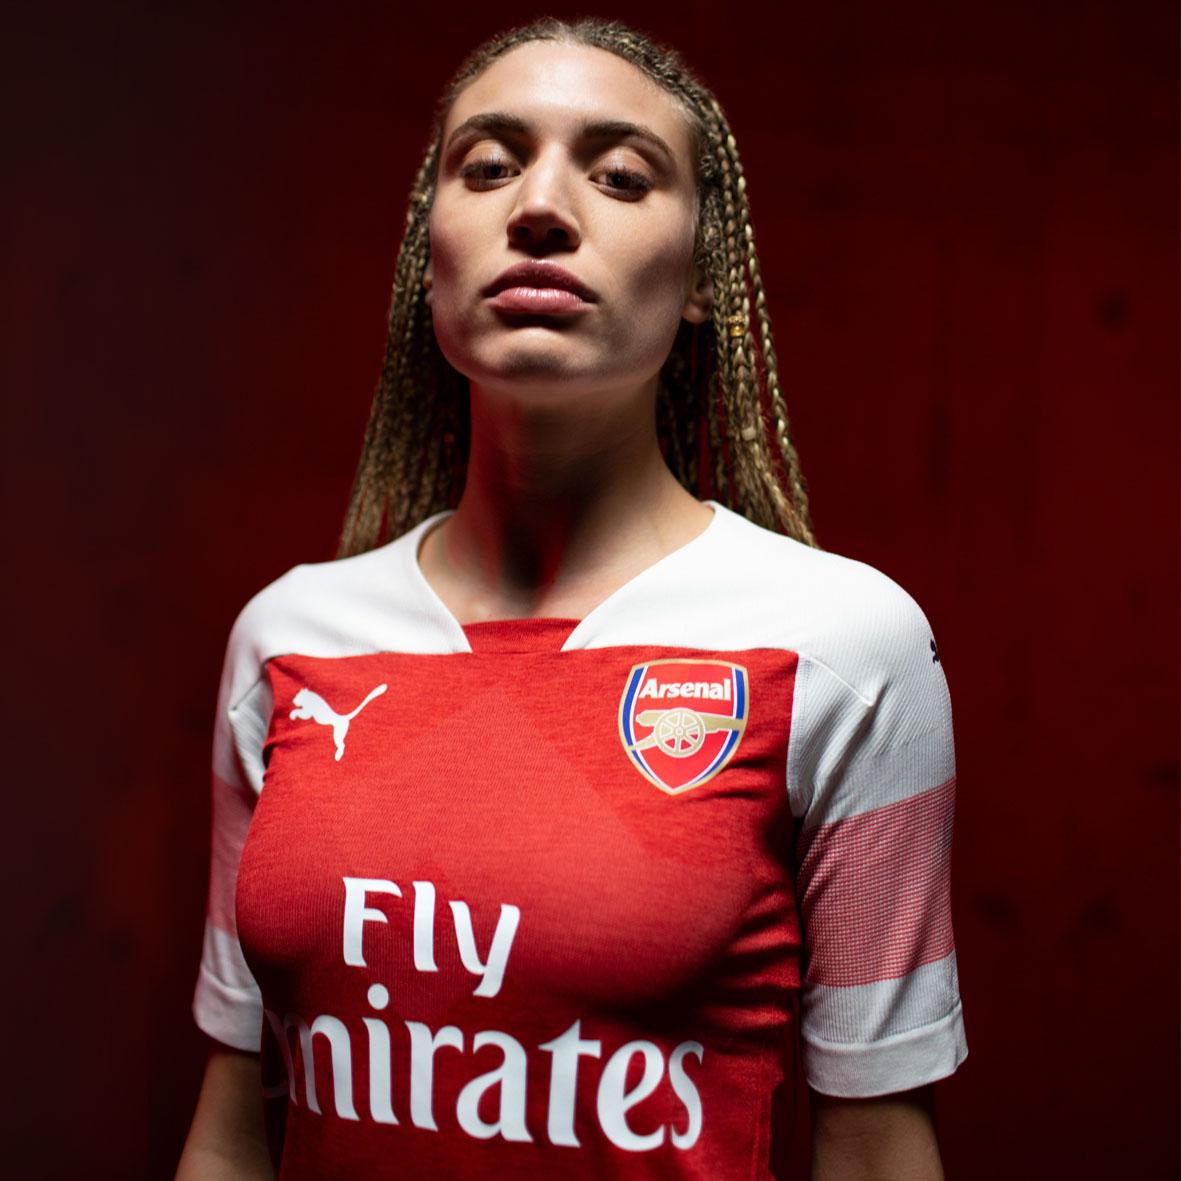 Arsenal FC 2018/19 PUMA Home Kit